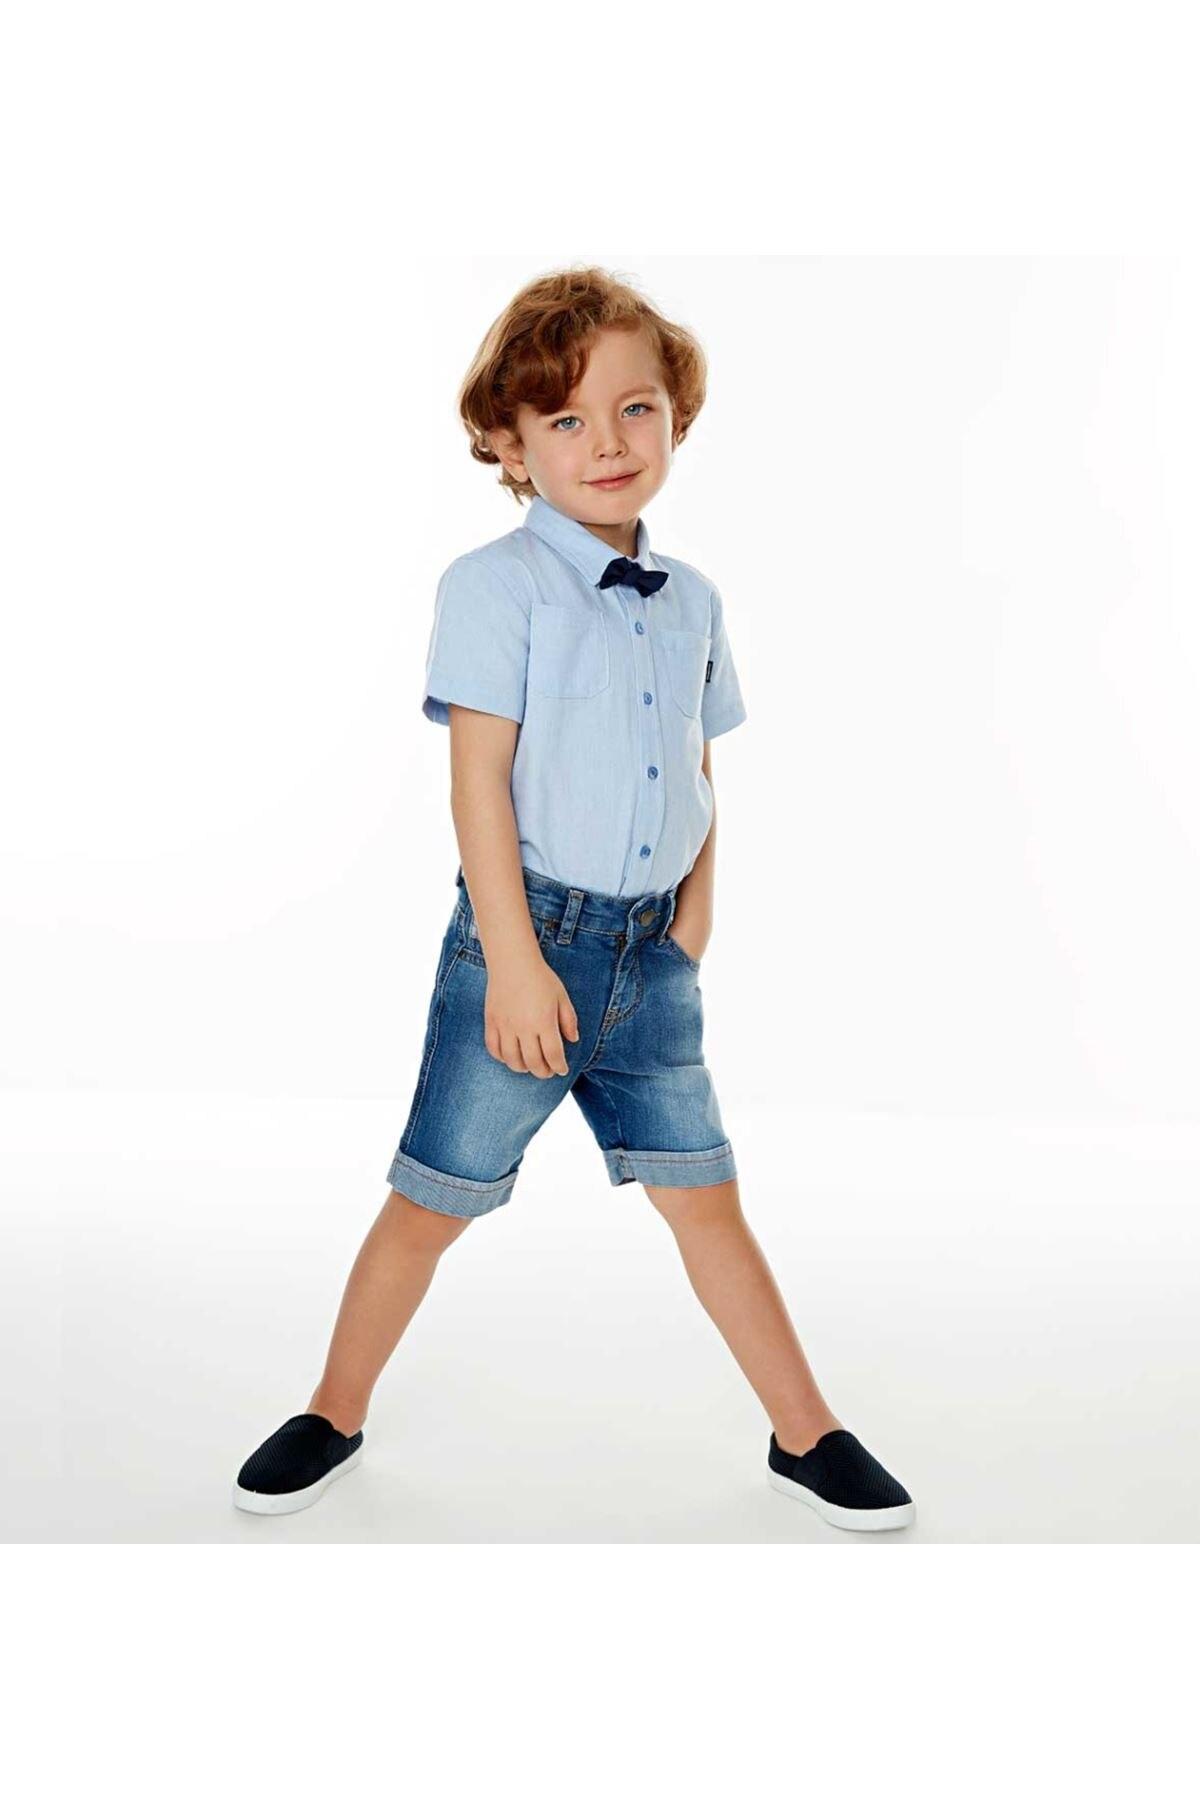 Wonder Kids Male Child Denim Shorts 010-7264-012